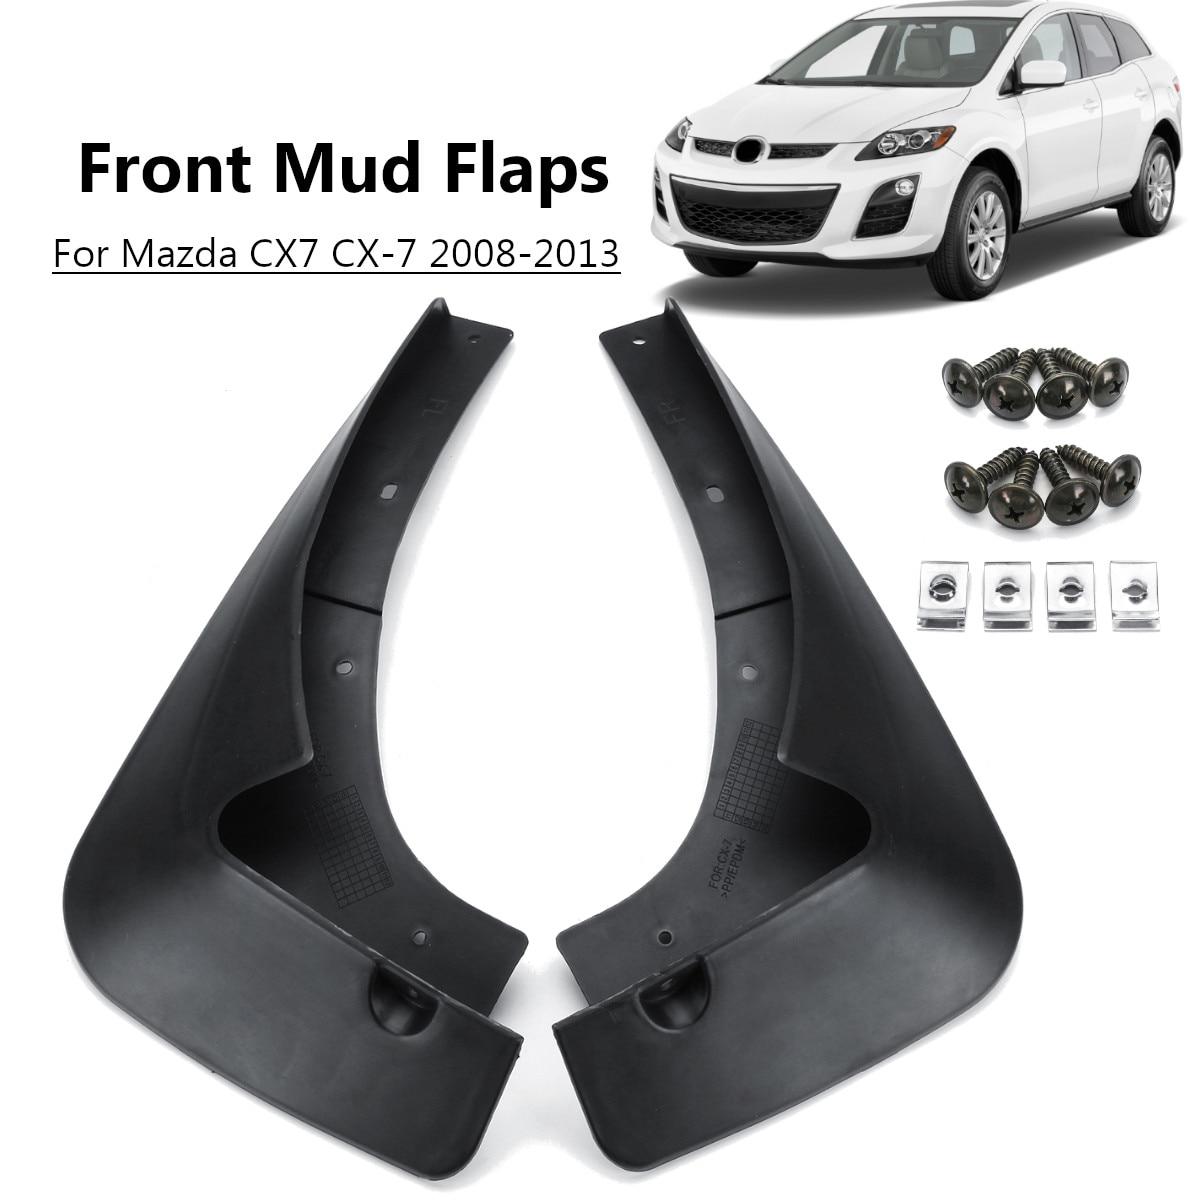 2pcs For Mazda CX7 CX-7 2008-2013 Car Rear Front Mud Flaps Fender Flares Mudguards Mudflaps Splash Guards